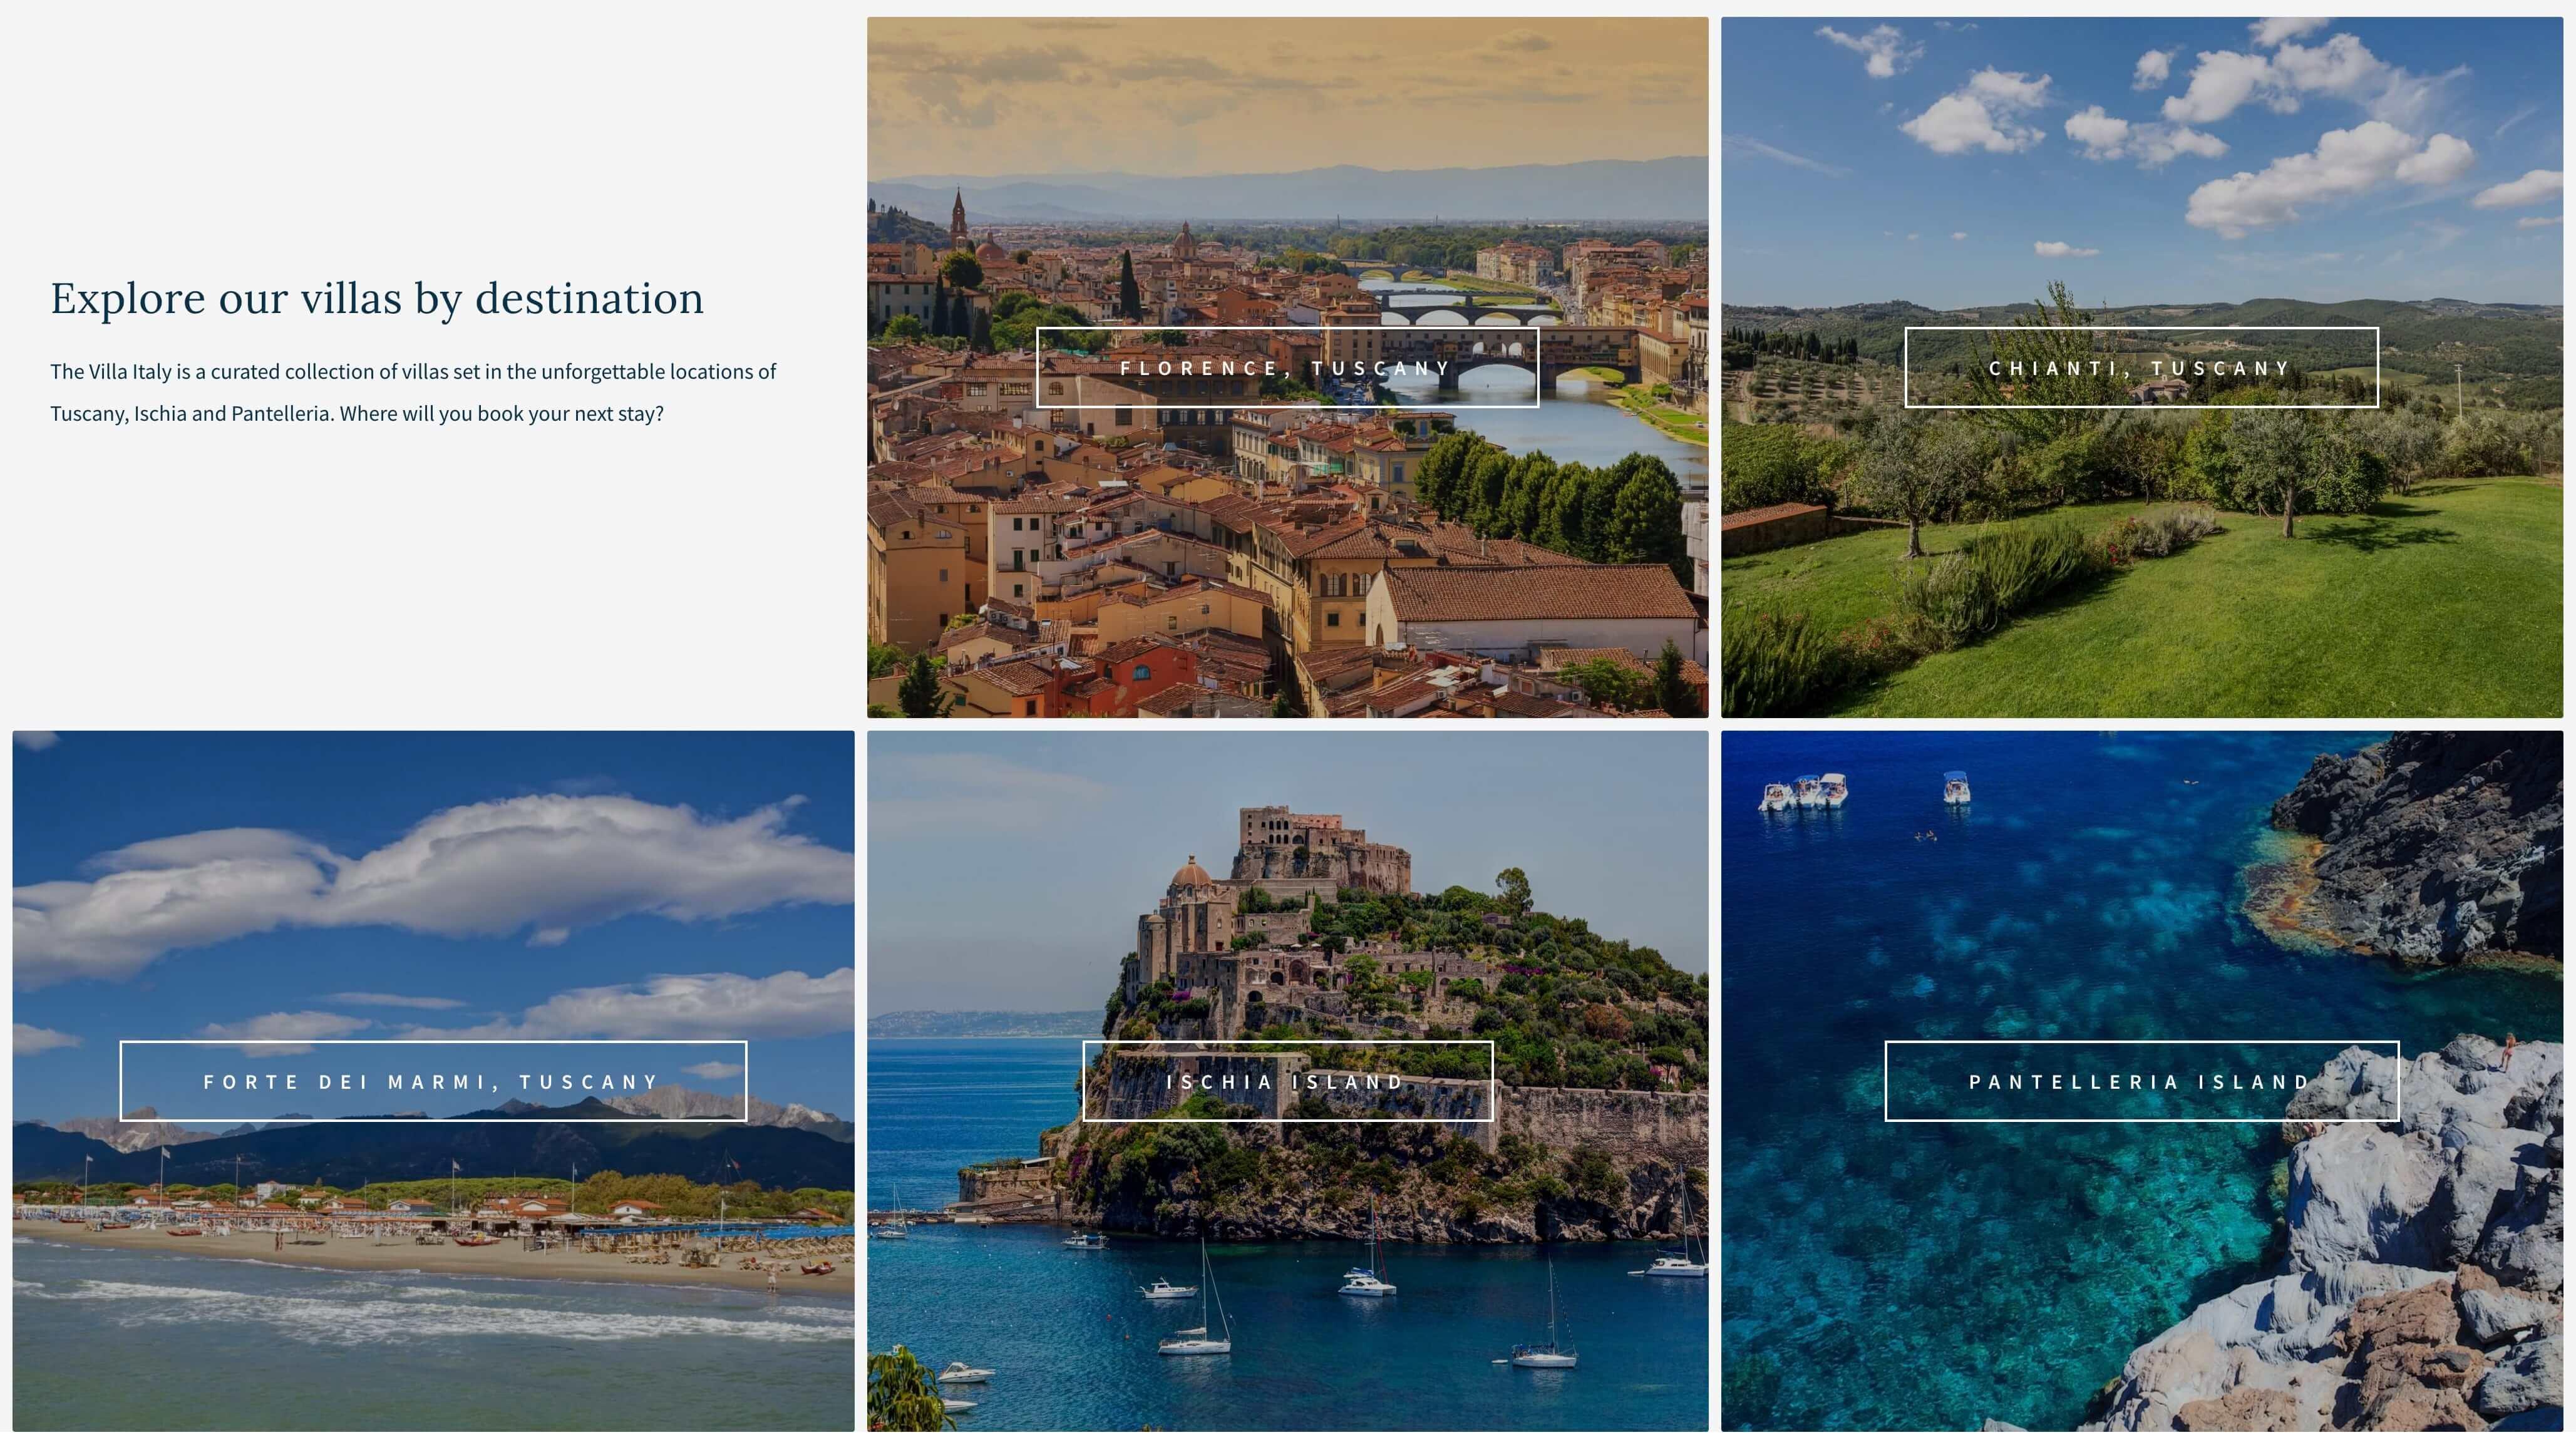 WordPress Website Design & Development - Destinations Section - The Villa Italy